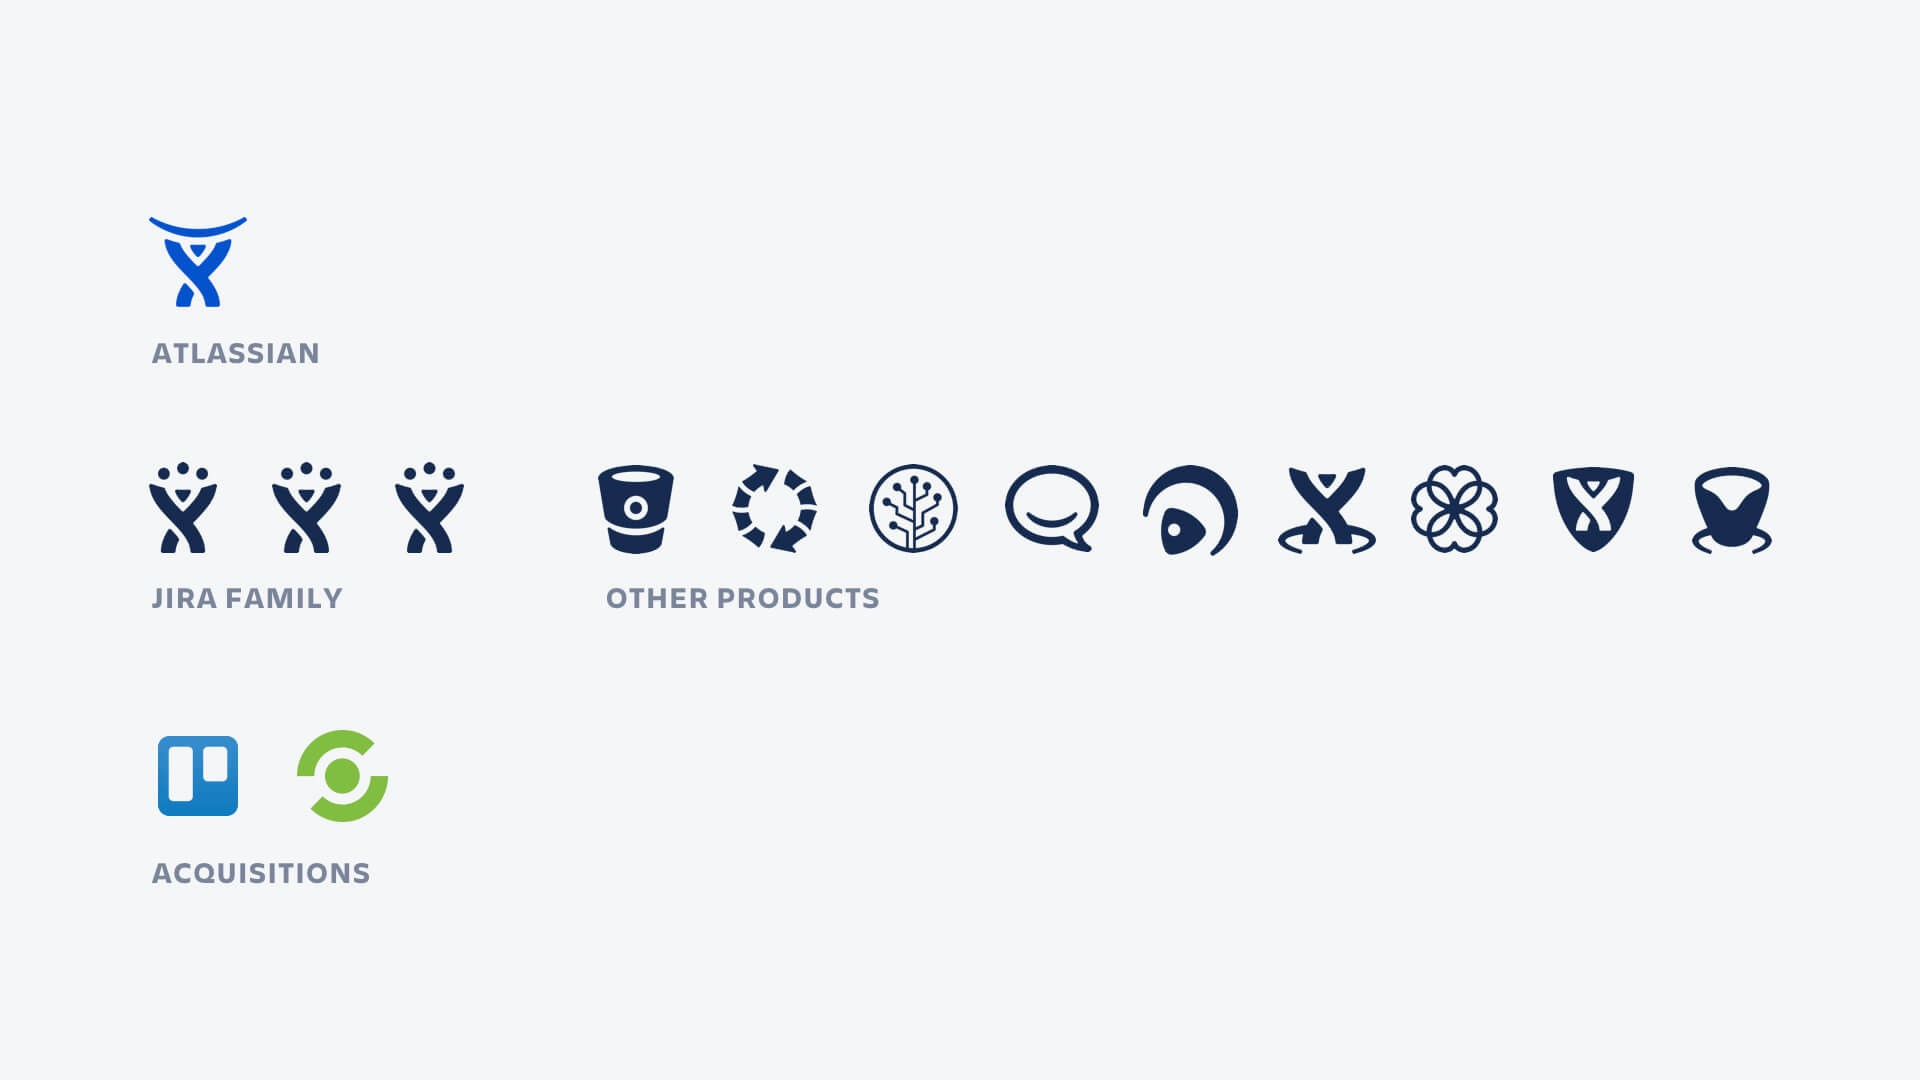 Atlassian's Former 'House of Brands' (source: https://medium.com/designing-atlassian/behind-the-scenes-of-the-atlassian-rebrand-f6ba1592377e)